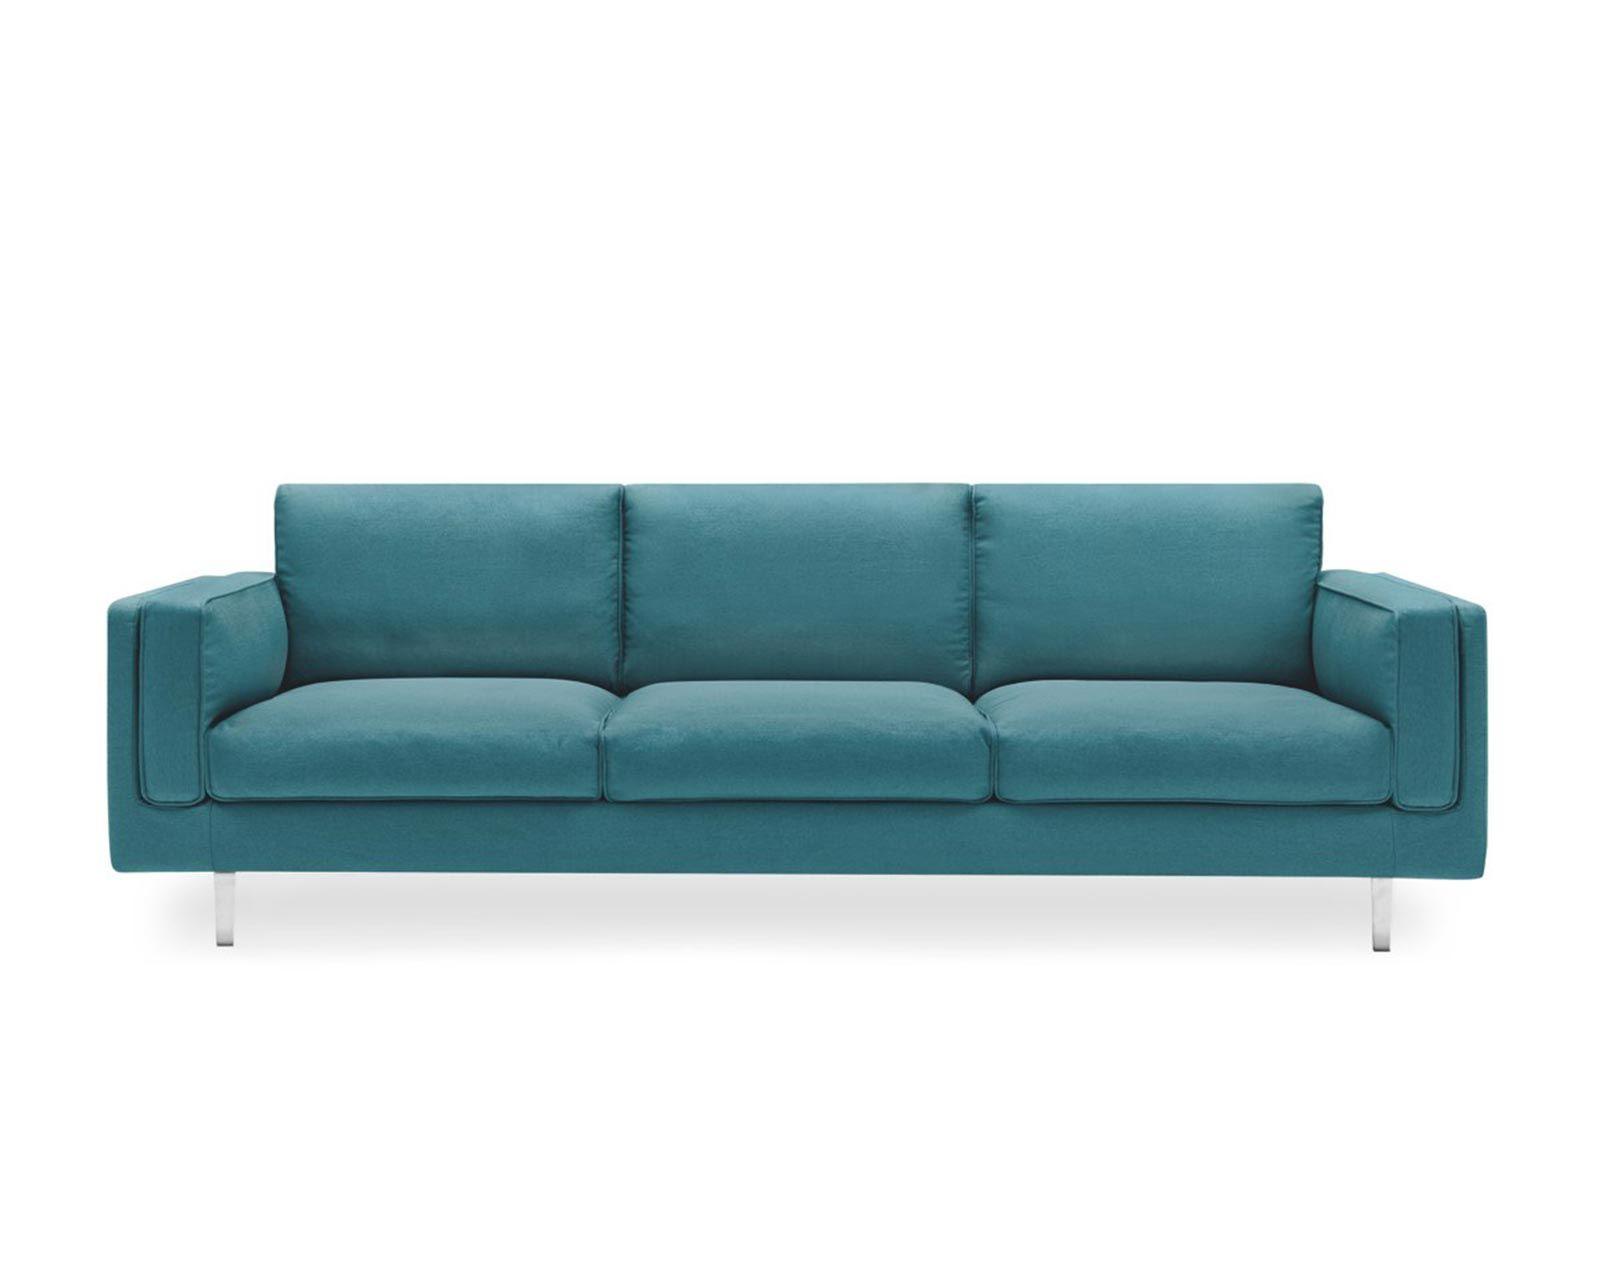 Open base modular sofa Metro Calligaris CS 3370